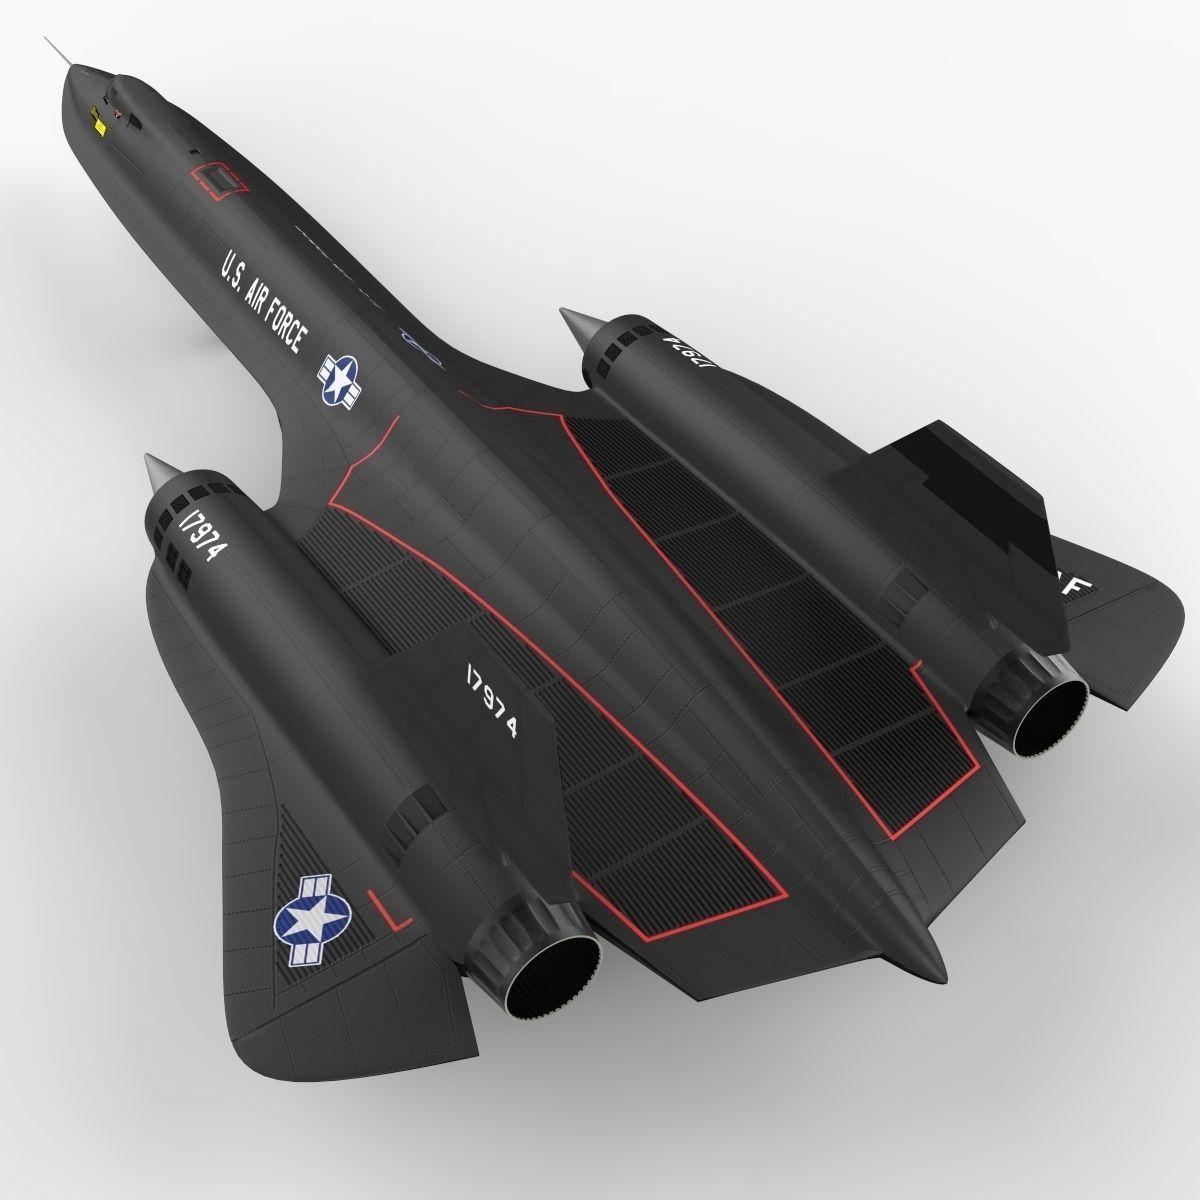 3d sr-71 spy plane model